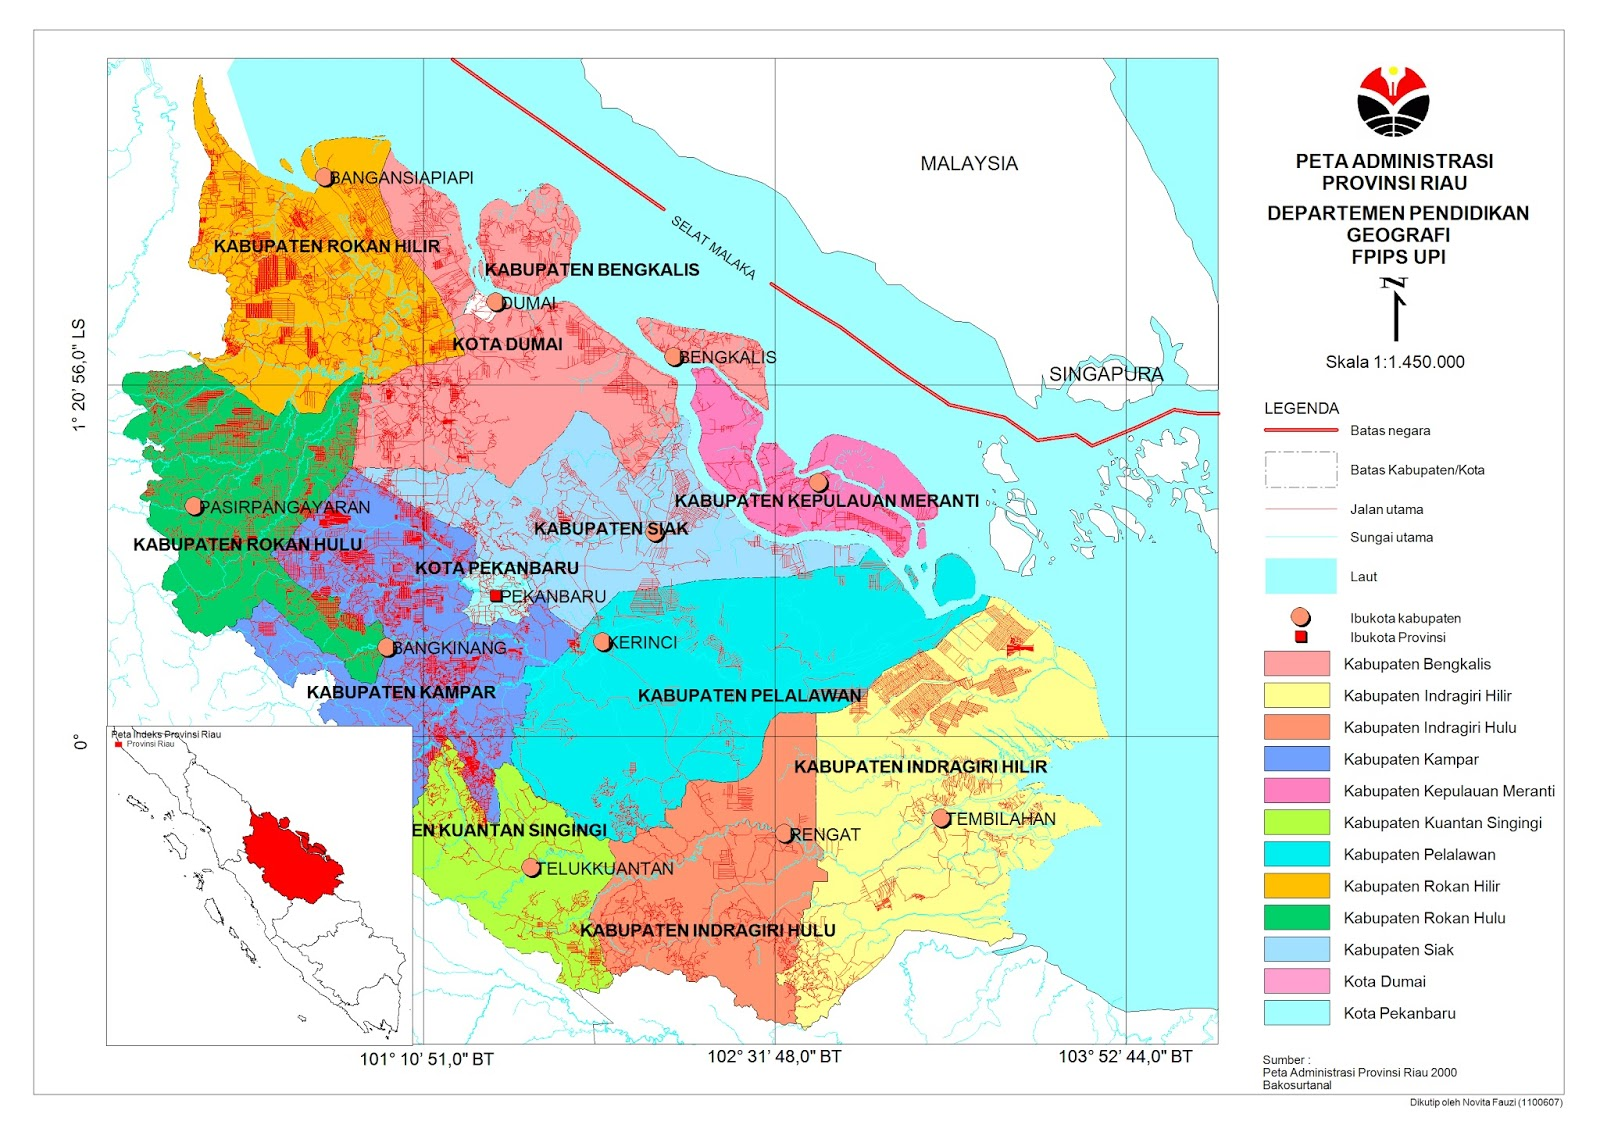 Saya, Bandung dan Geografi